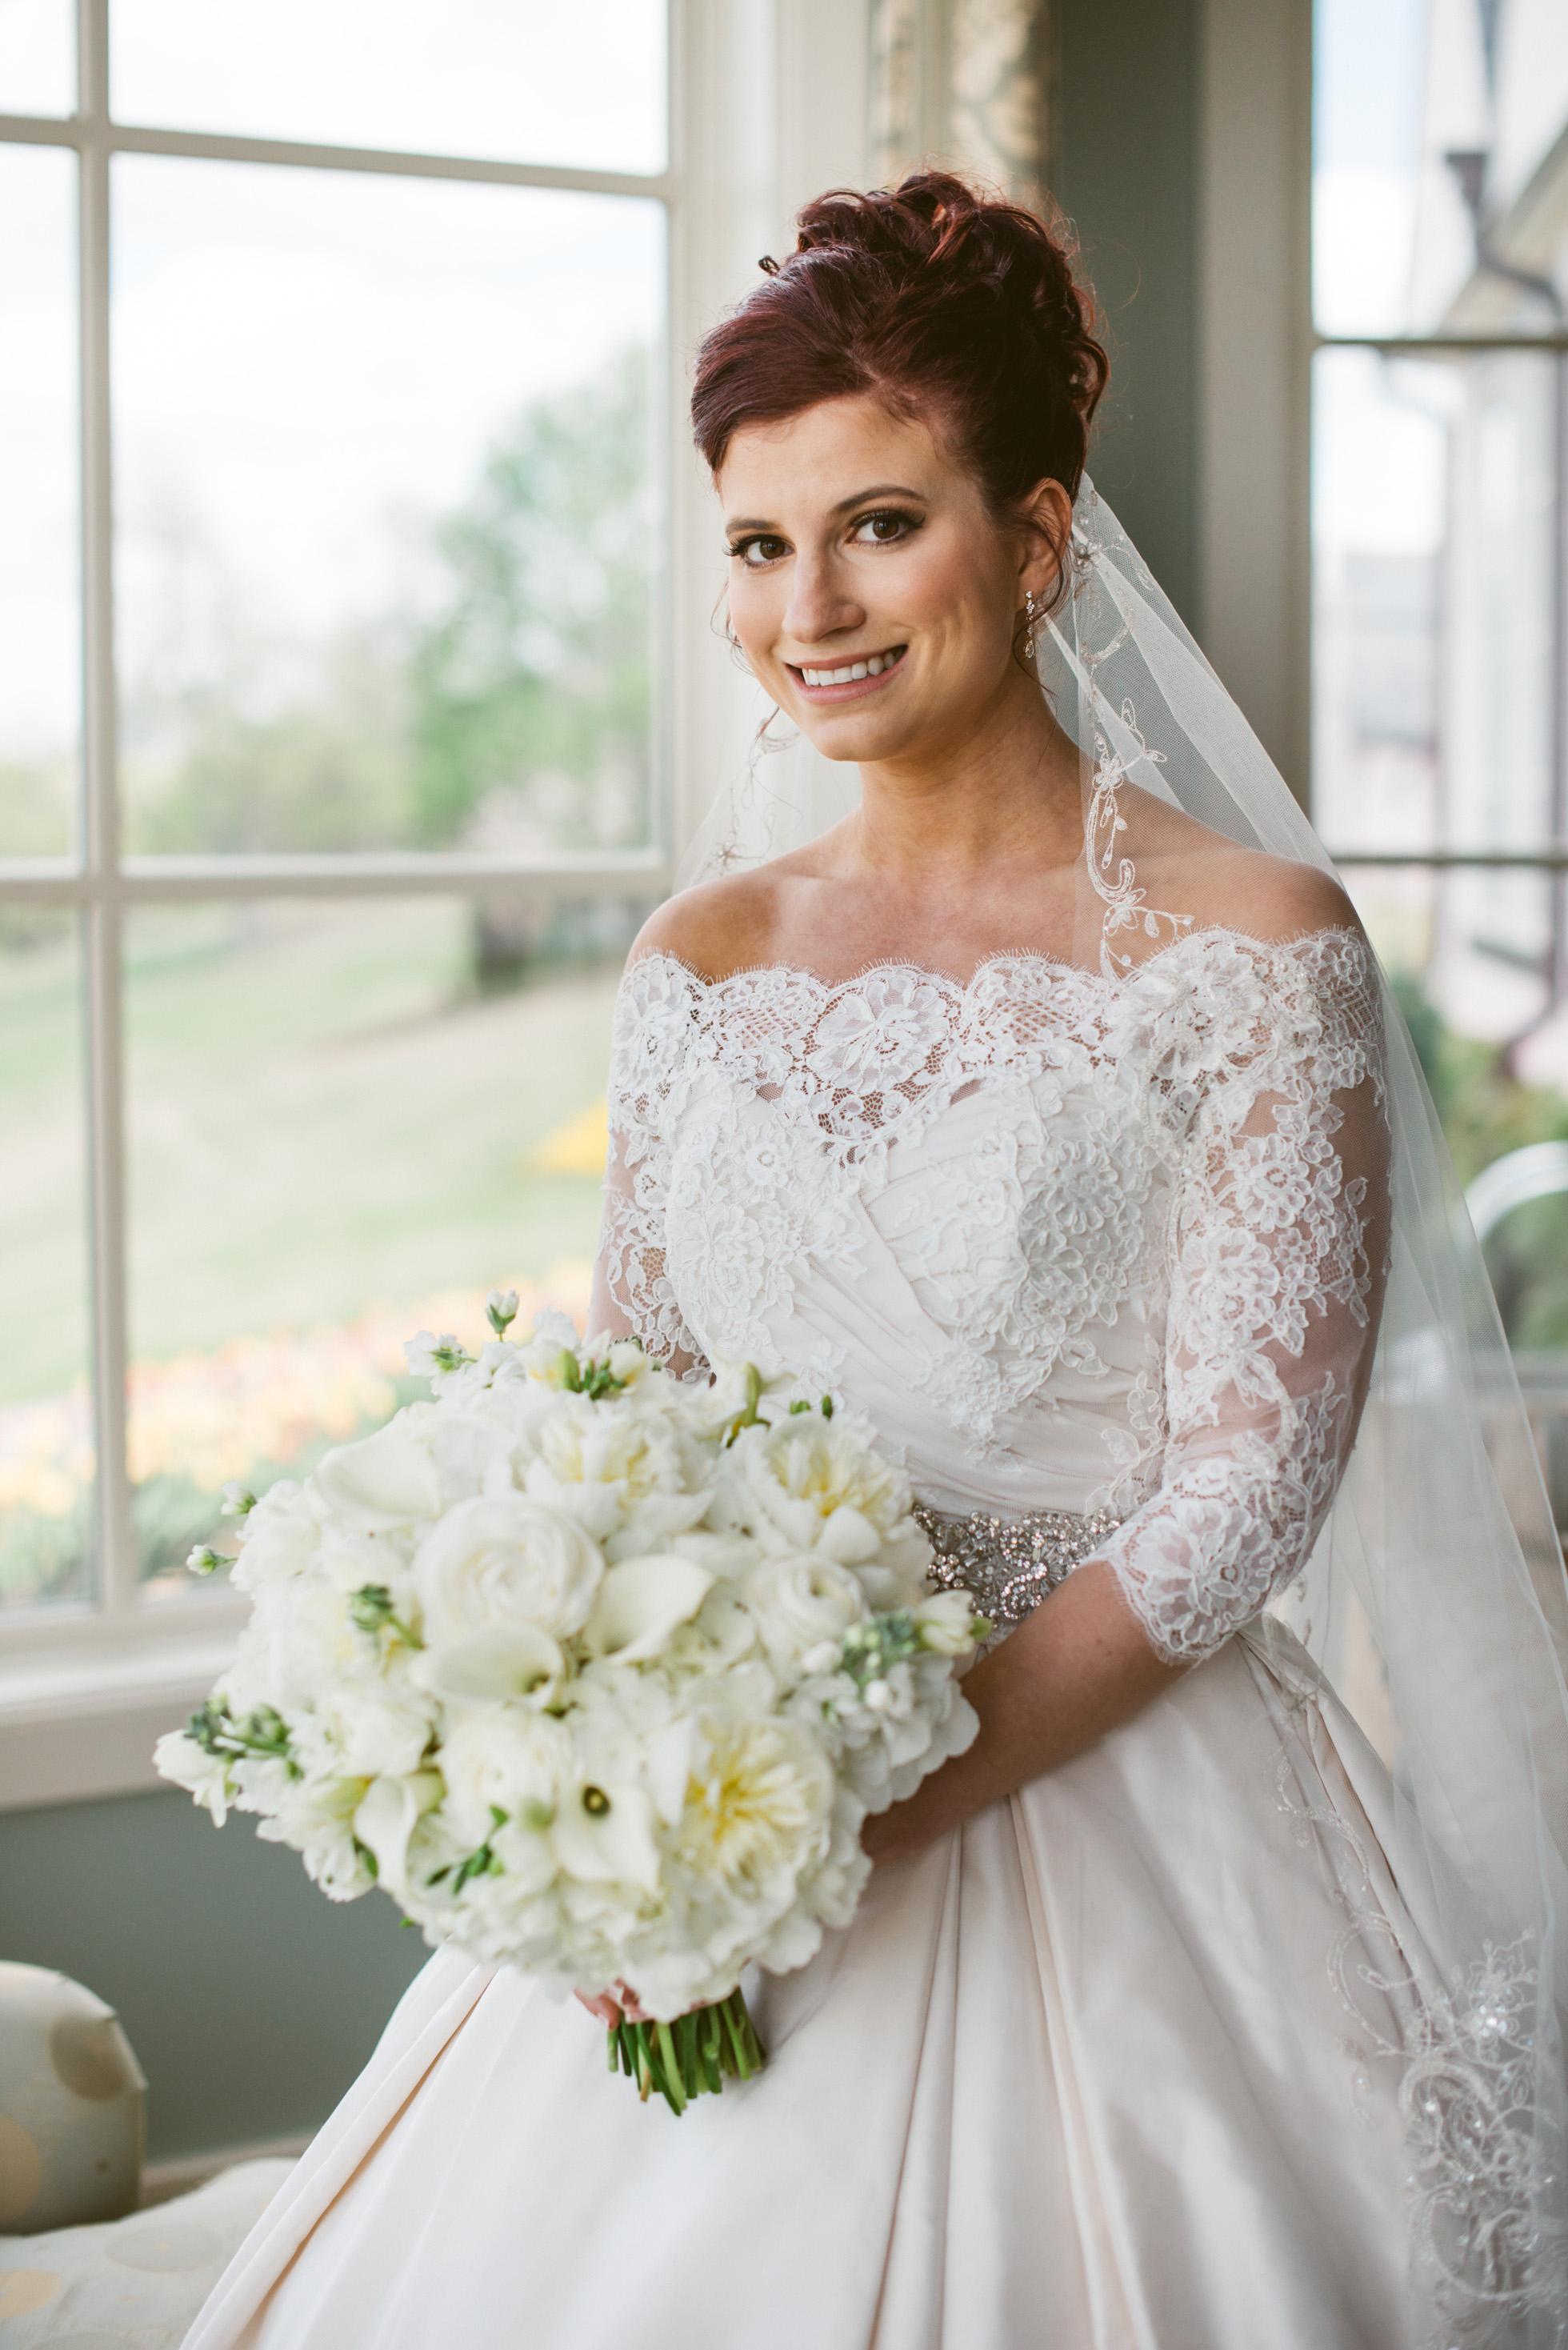 Southern Hills Country Club Tulsa Bridals Landry